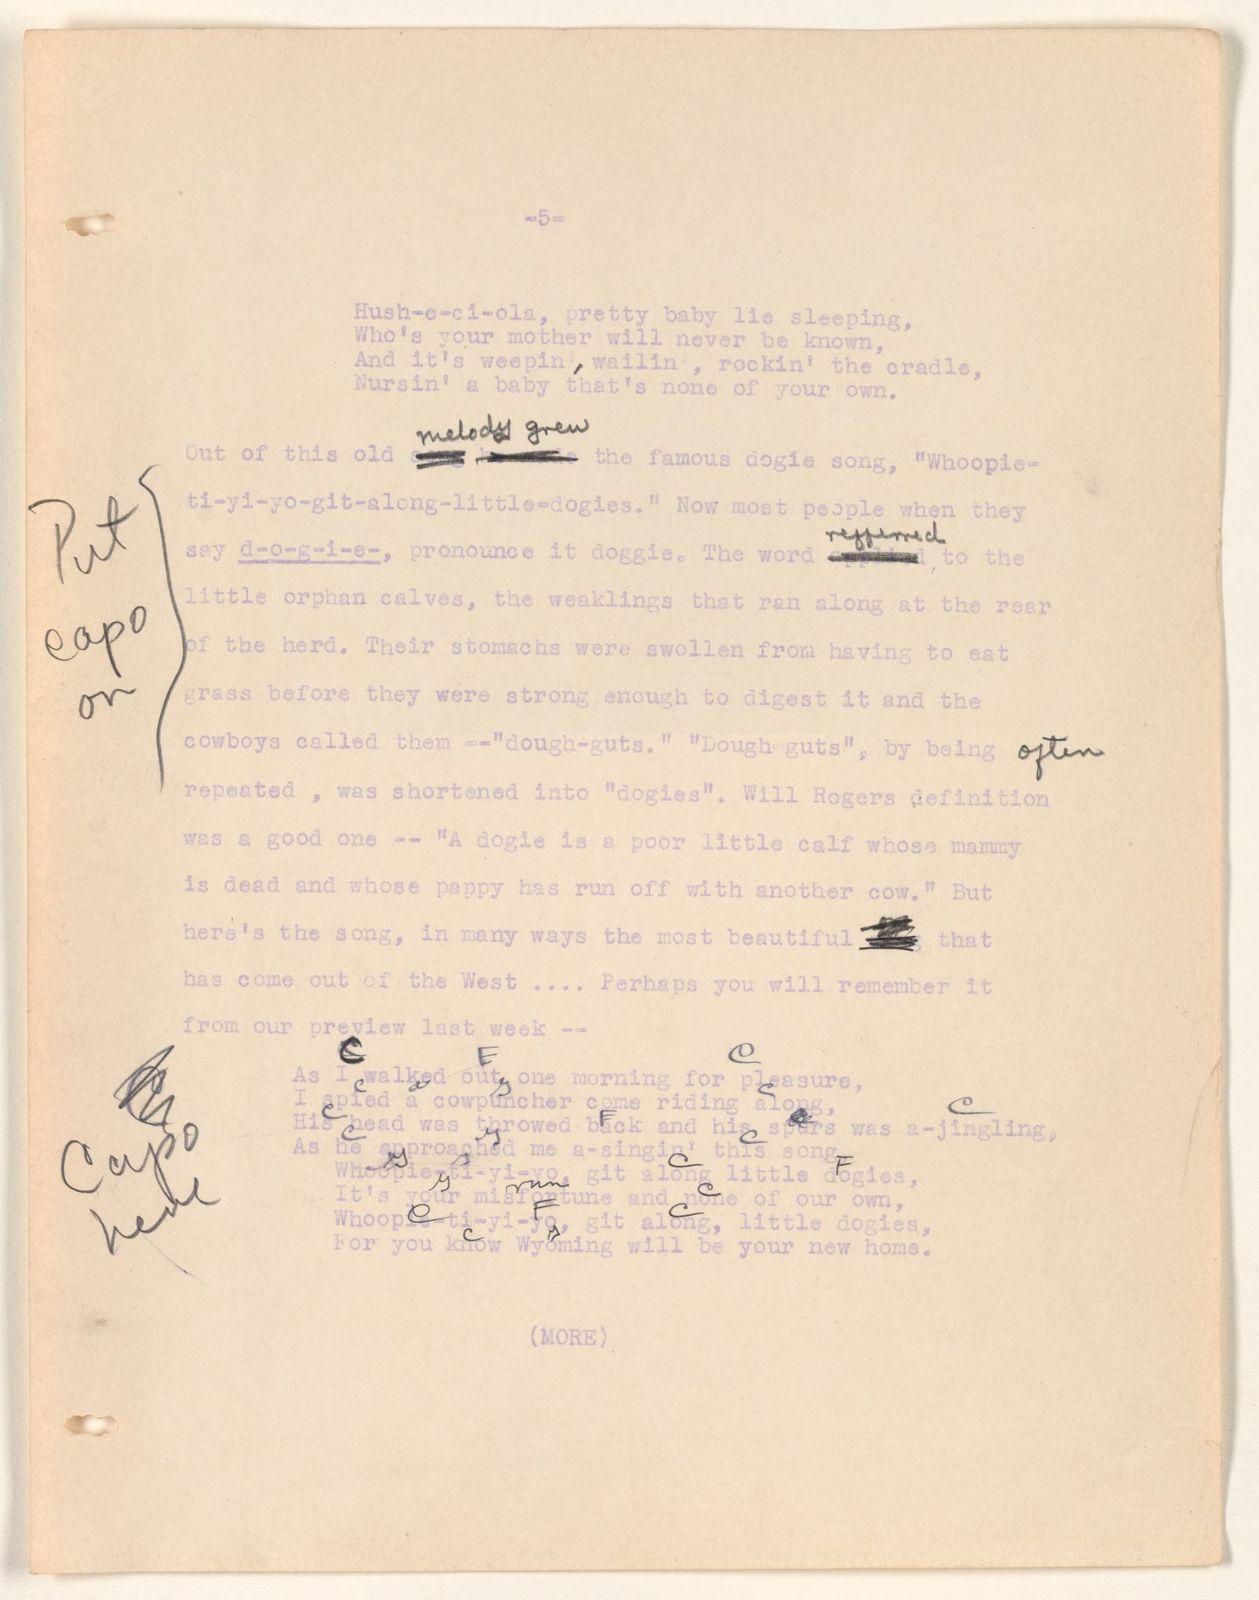 Alan Lomax Collection, Manuscripts, CBS, 1939-1940, American School